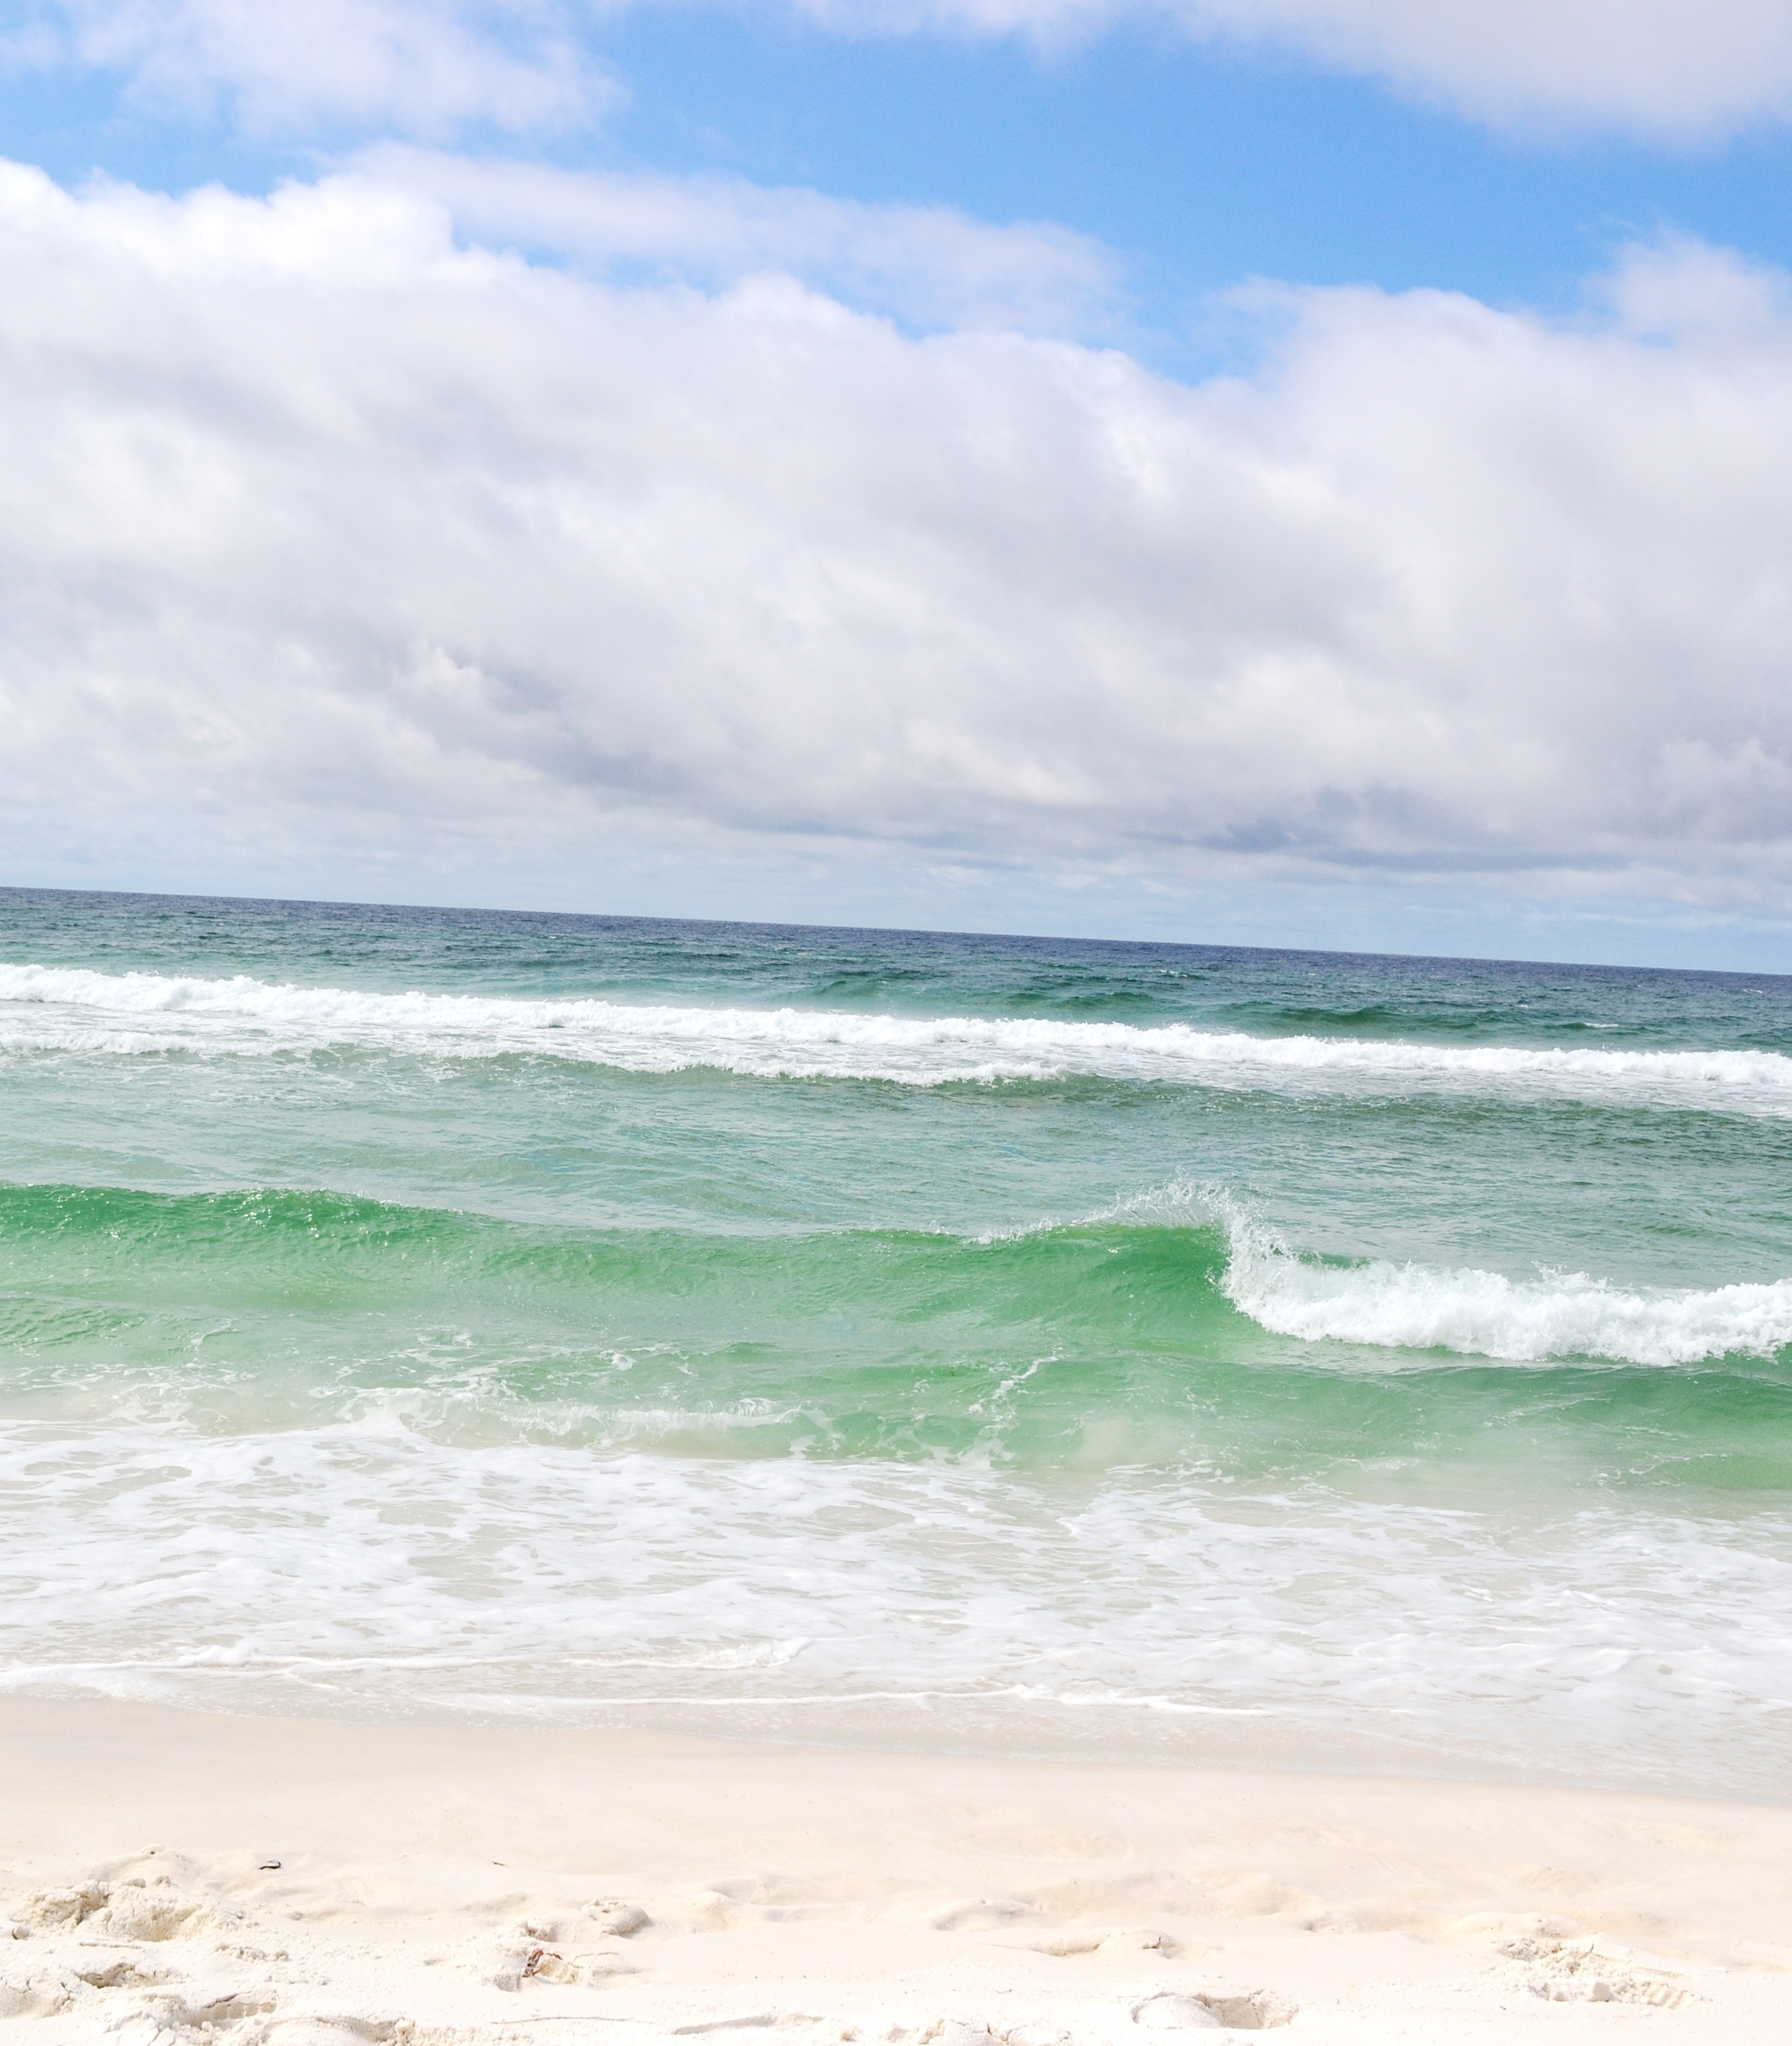 Beachfront Motels Fort Walton Beach Florida